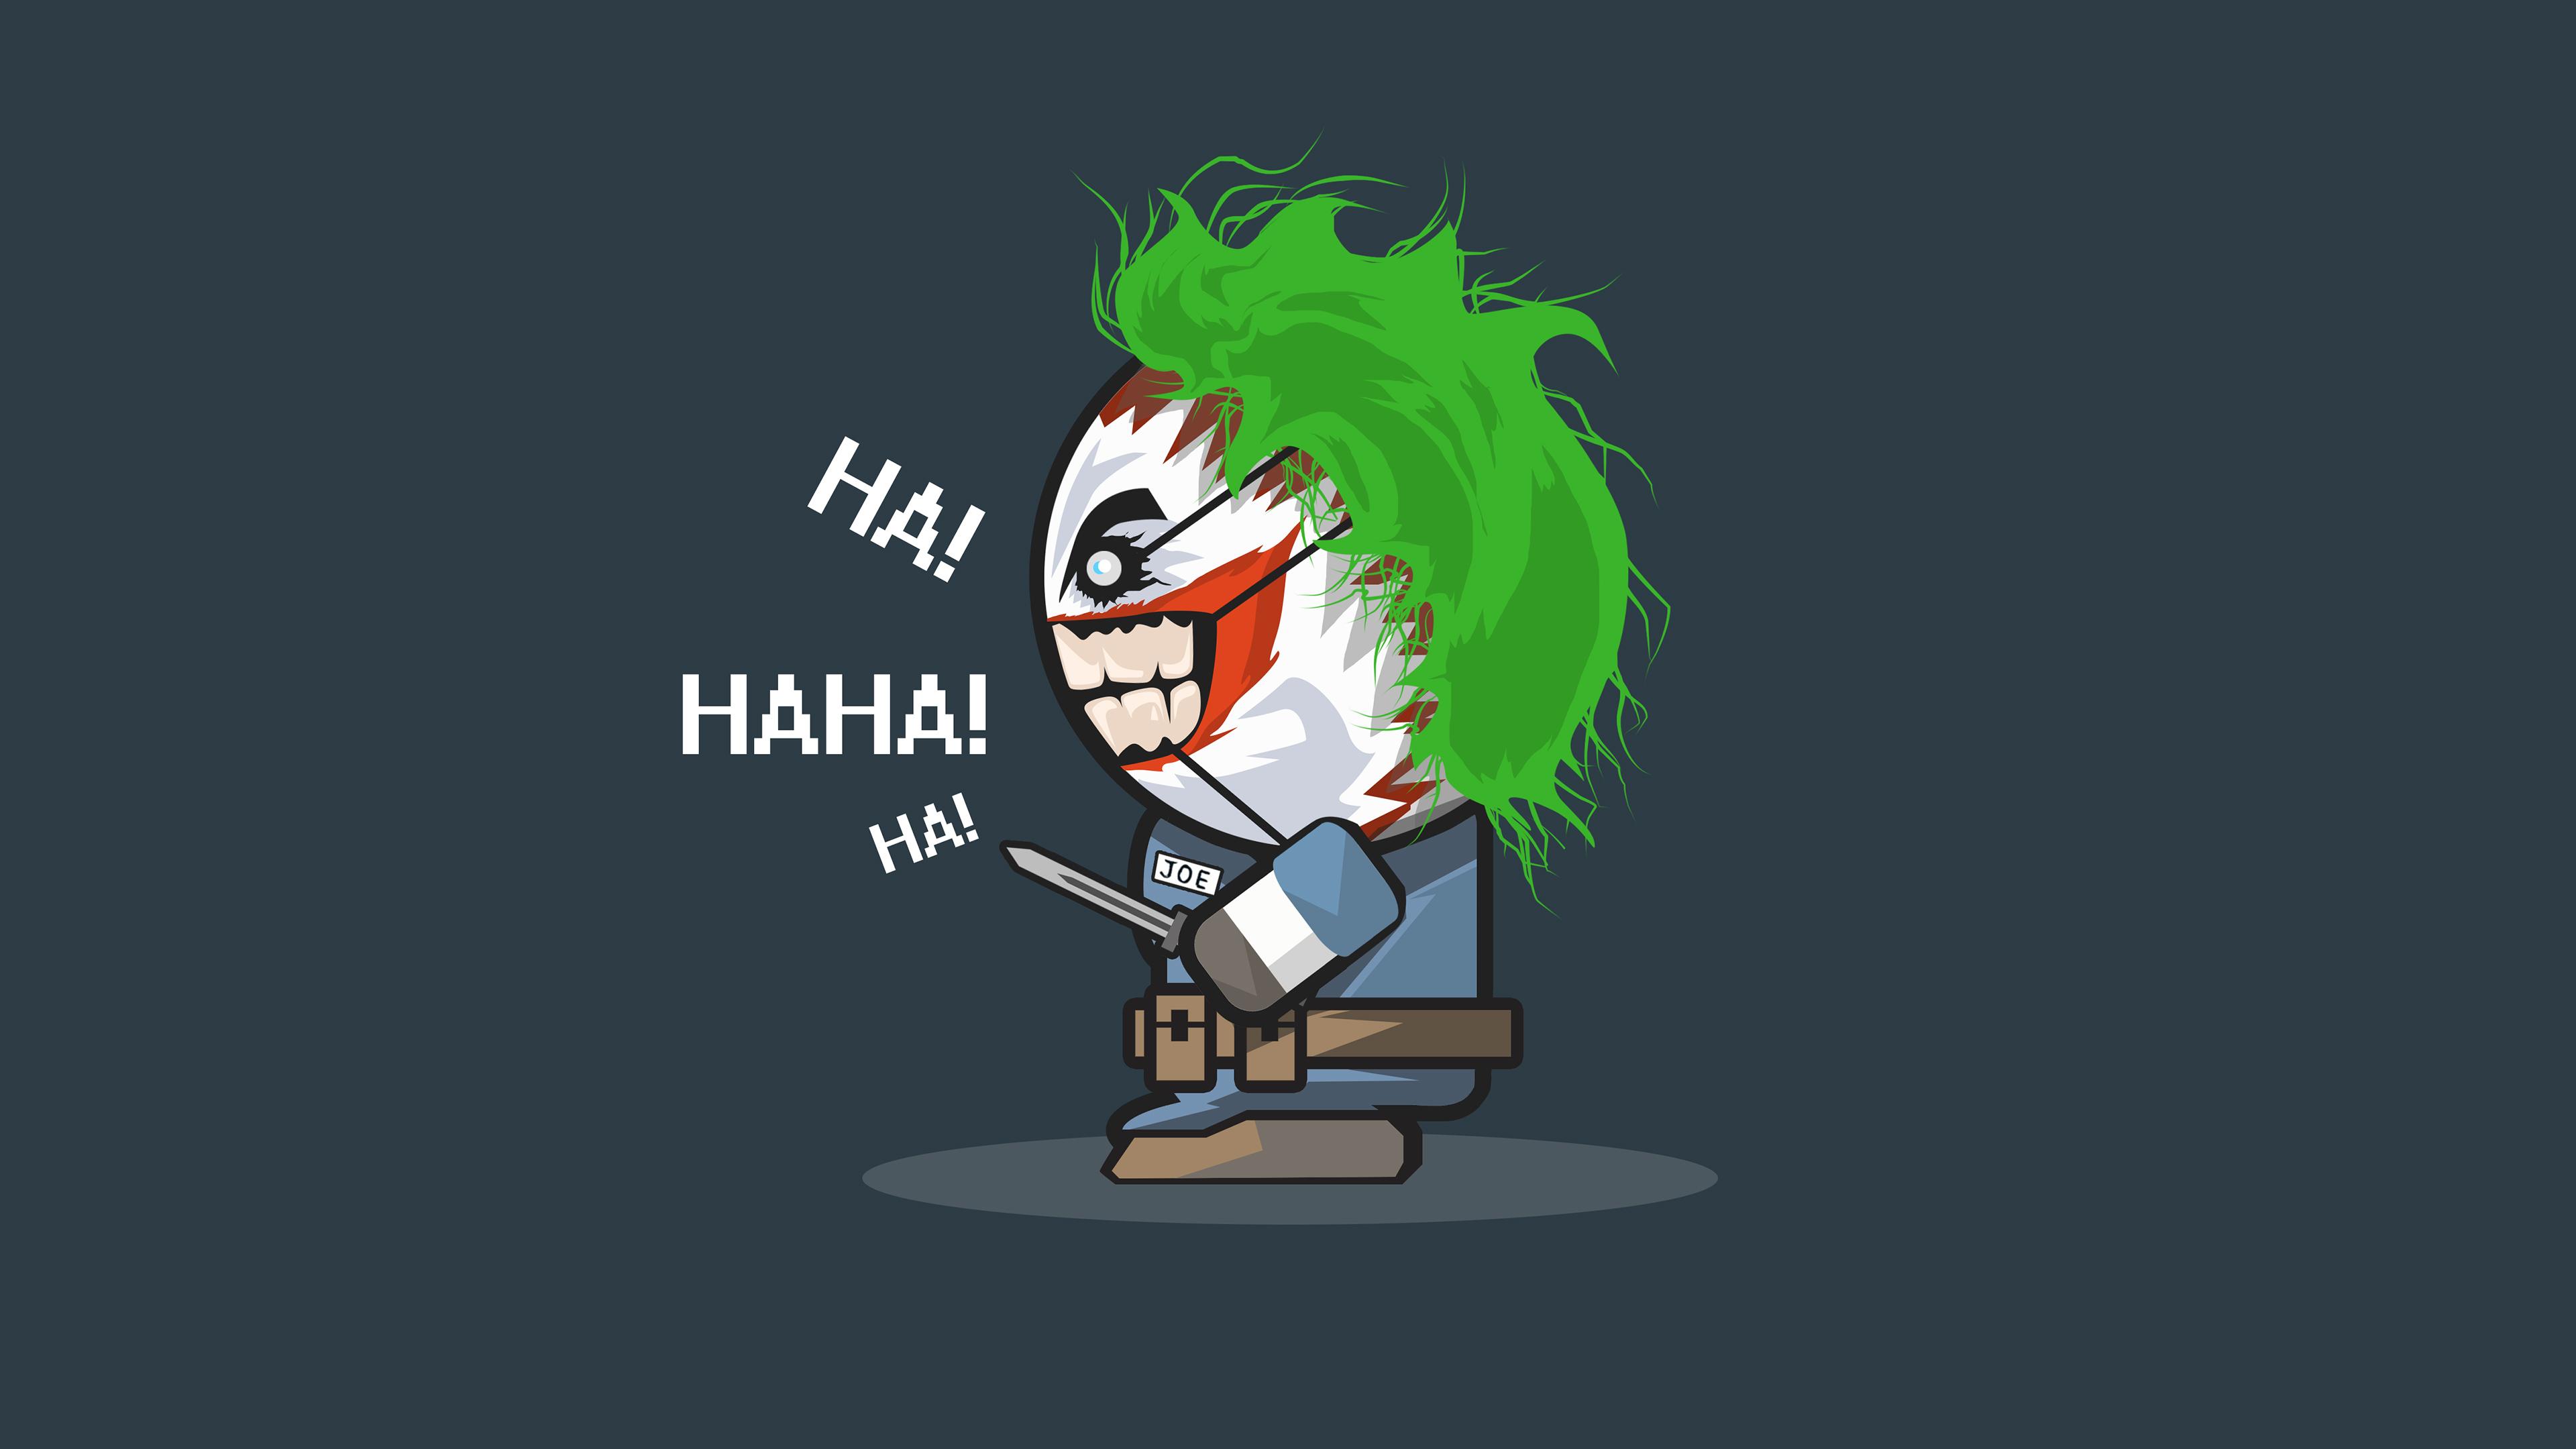 joker haha art 4k 1557260445 - Joker Haha Art 4k - superheroes wallpapers, joker wallpapers, hd-wallpapers, digital art wallpapers, artwork wallpapers, artist wallpapers, 4k-wallpapers